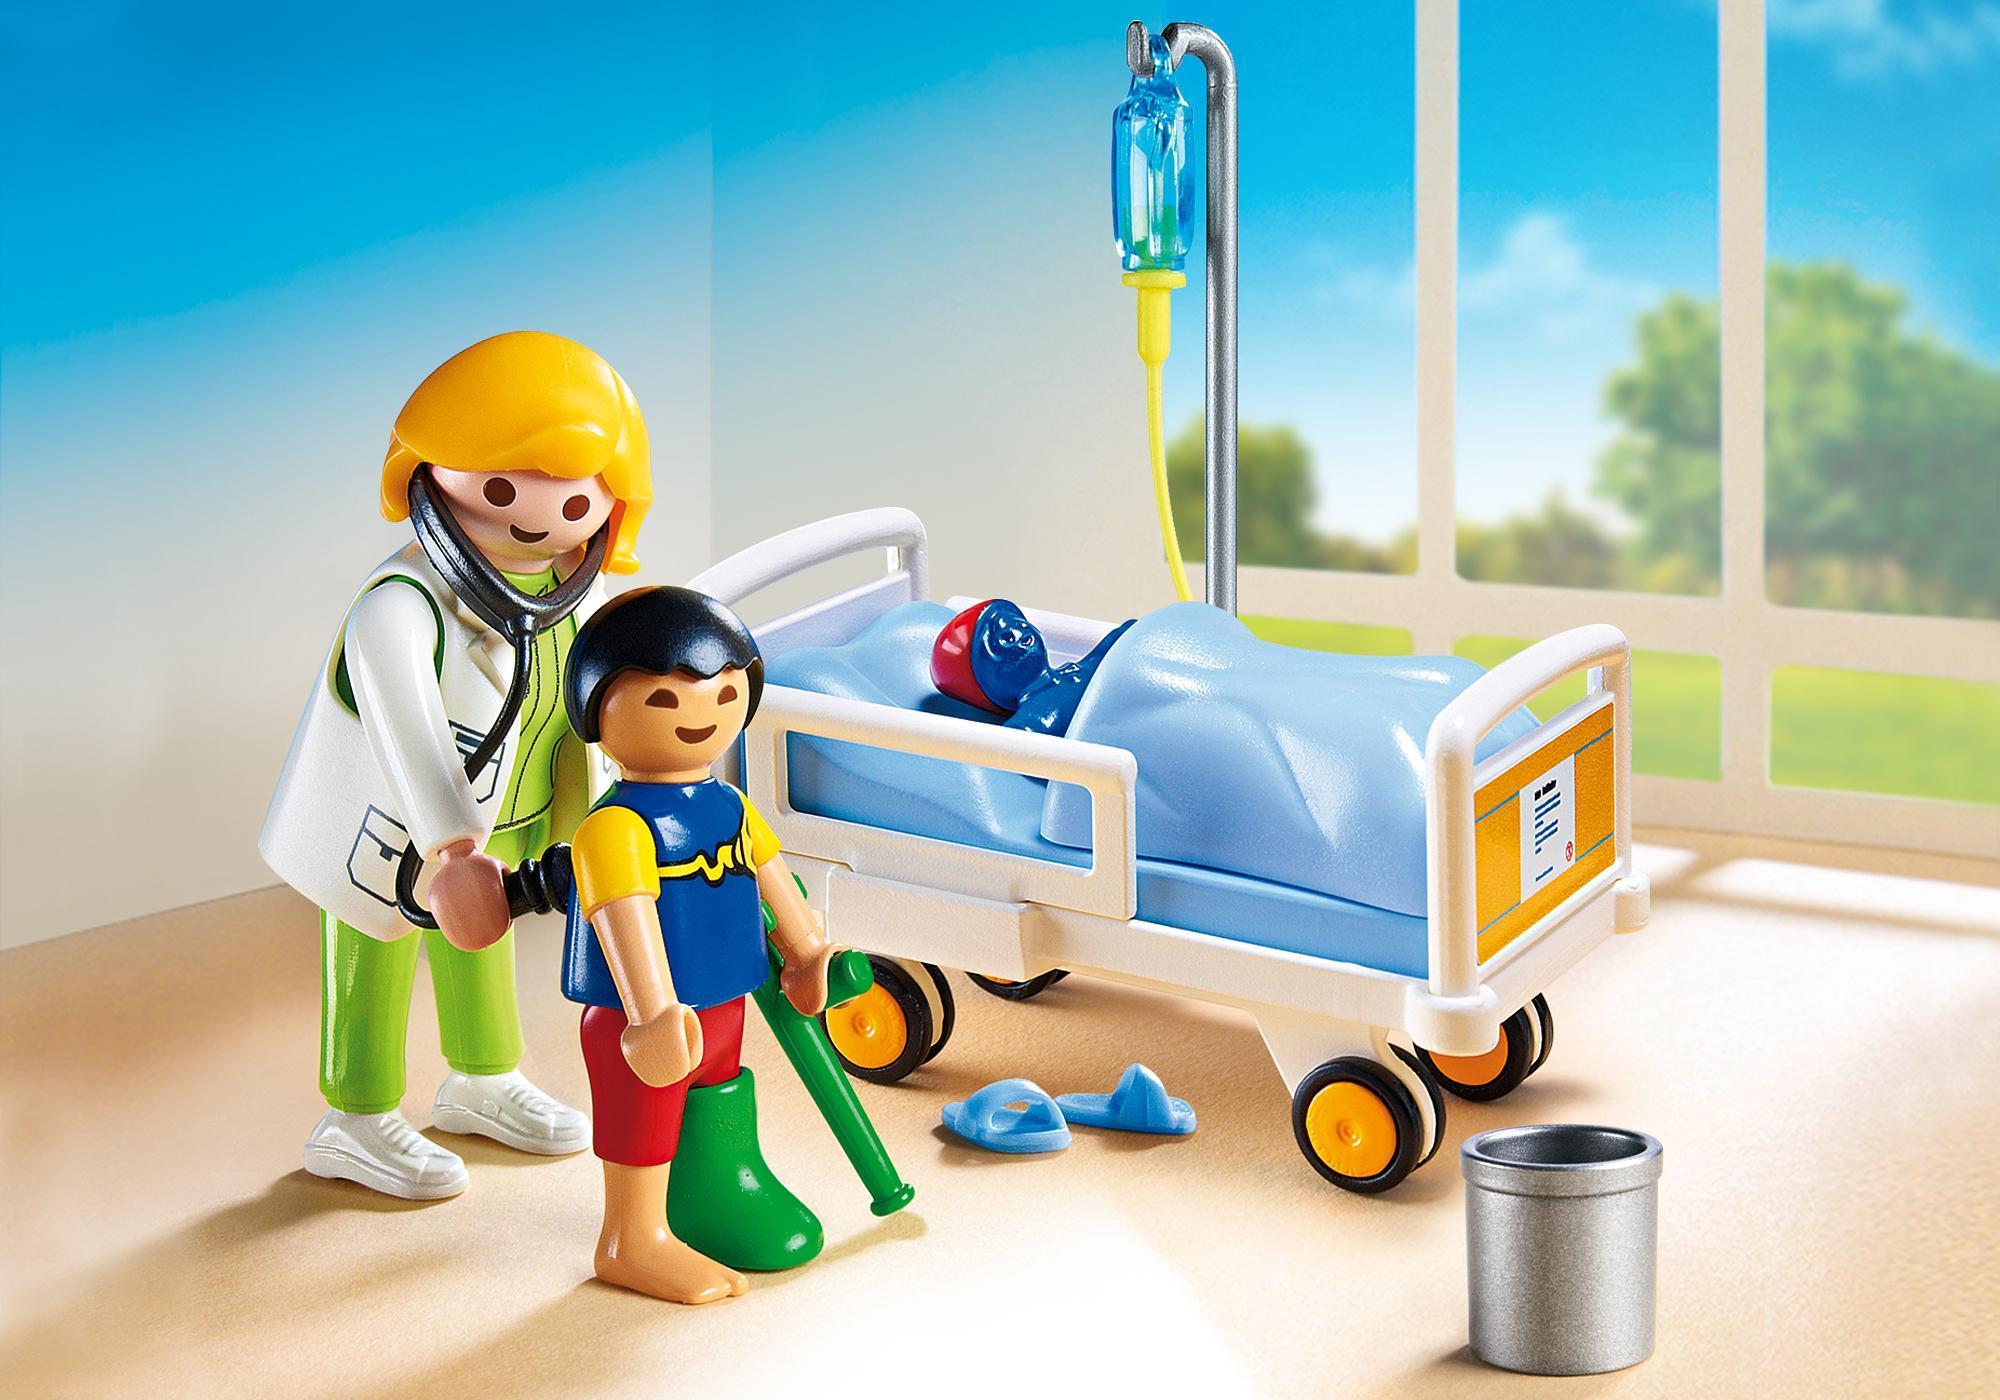 6661_product_detail/Doctora con niño